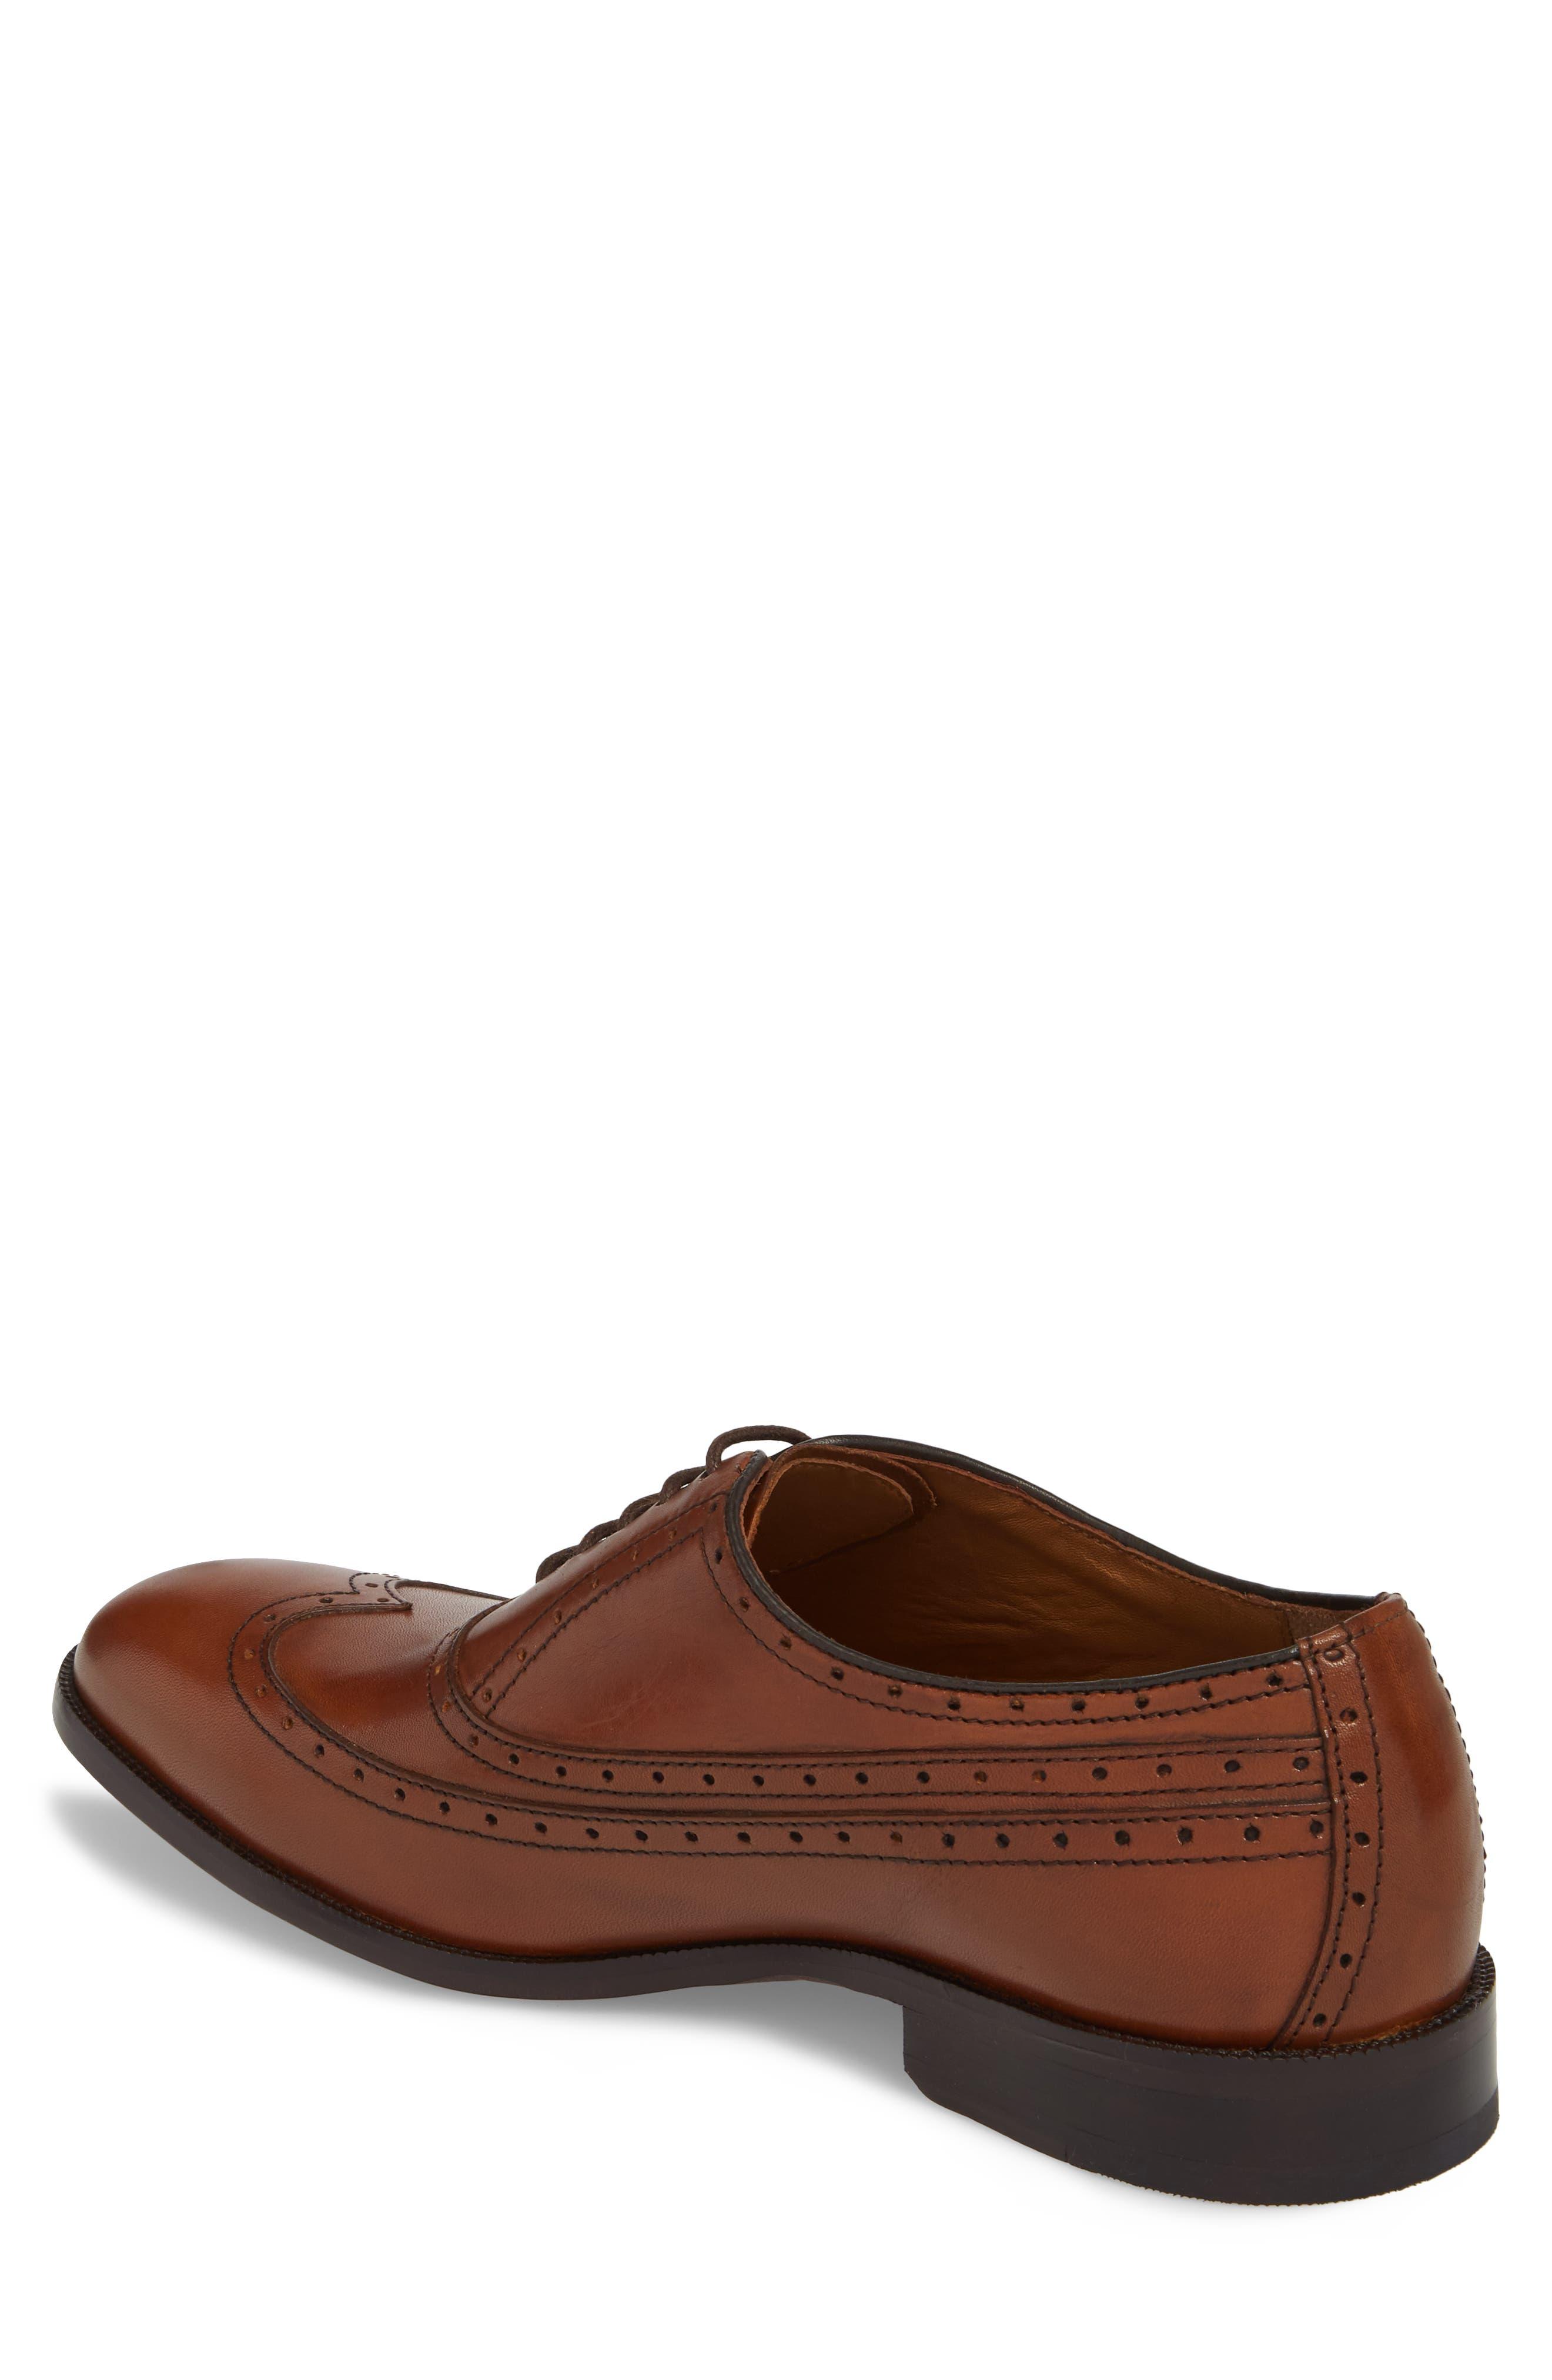 Bradford Wingtip Oxford,                             Alternate thumbnail 2, color,                             Tan Leather